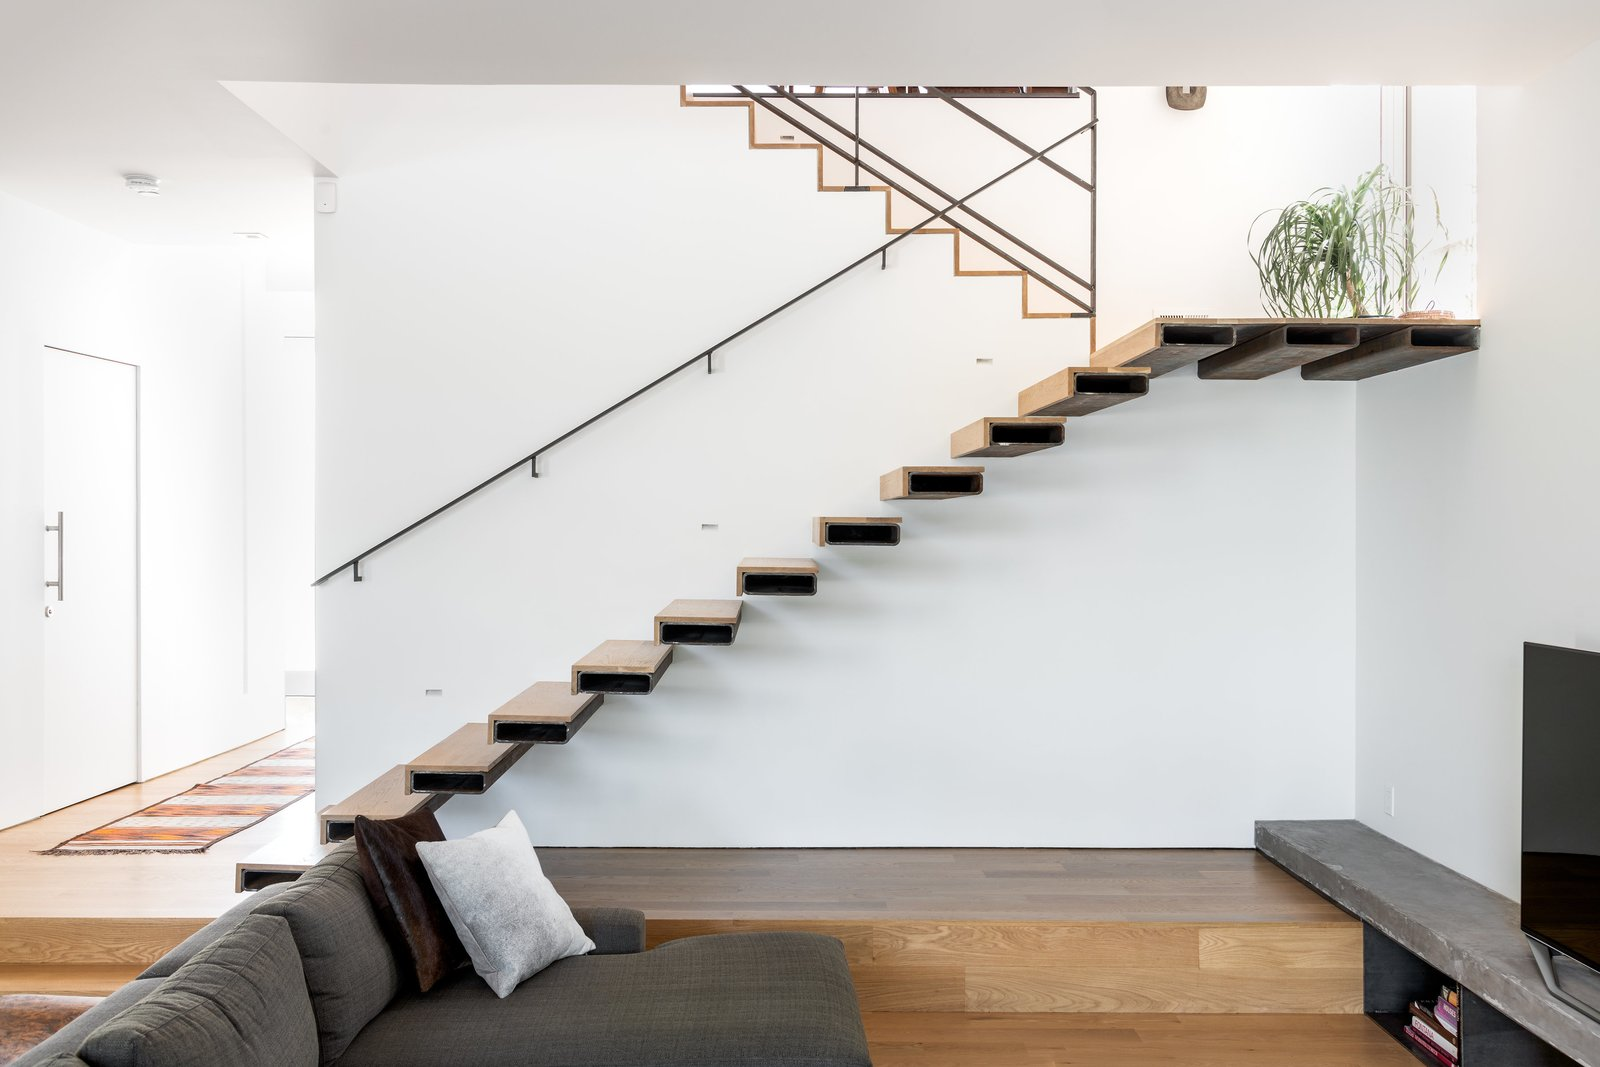 Staircase, Metal Tread, Metal Railing, and Wood Tread Stair Elevation  Spa Creek House by GriD